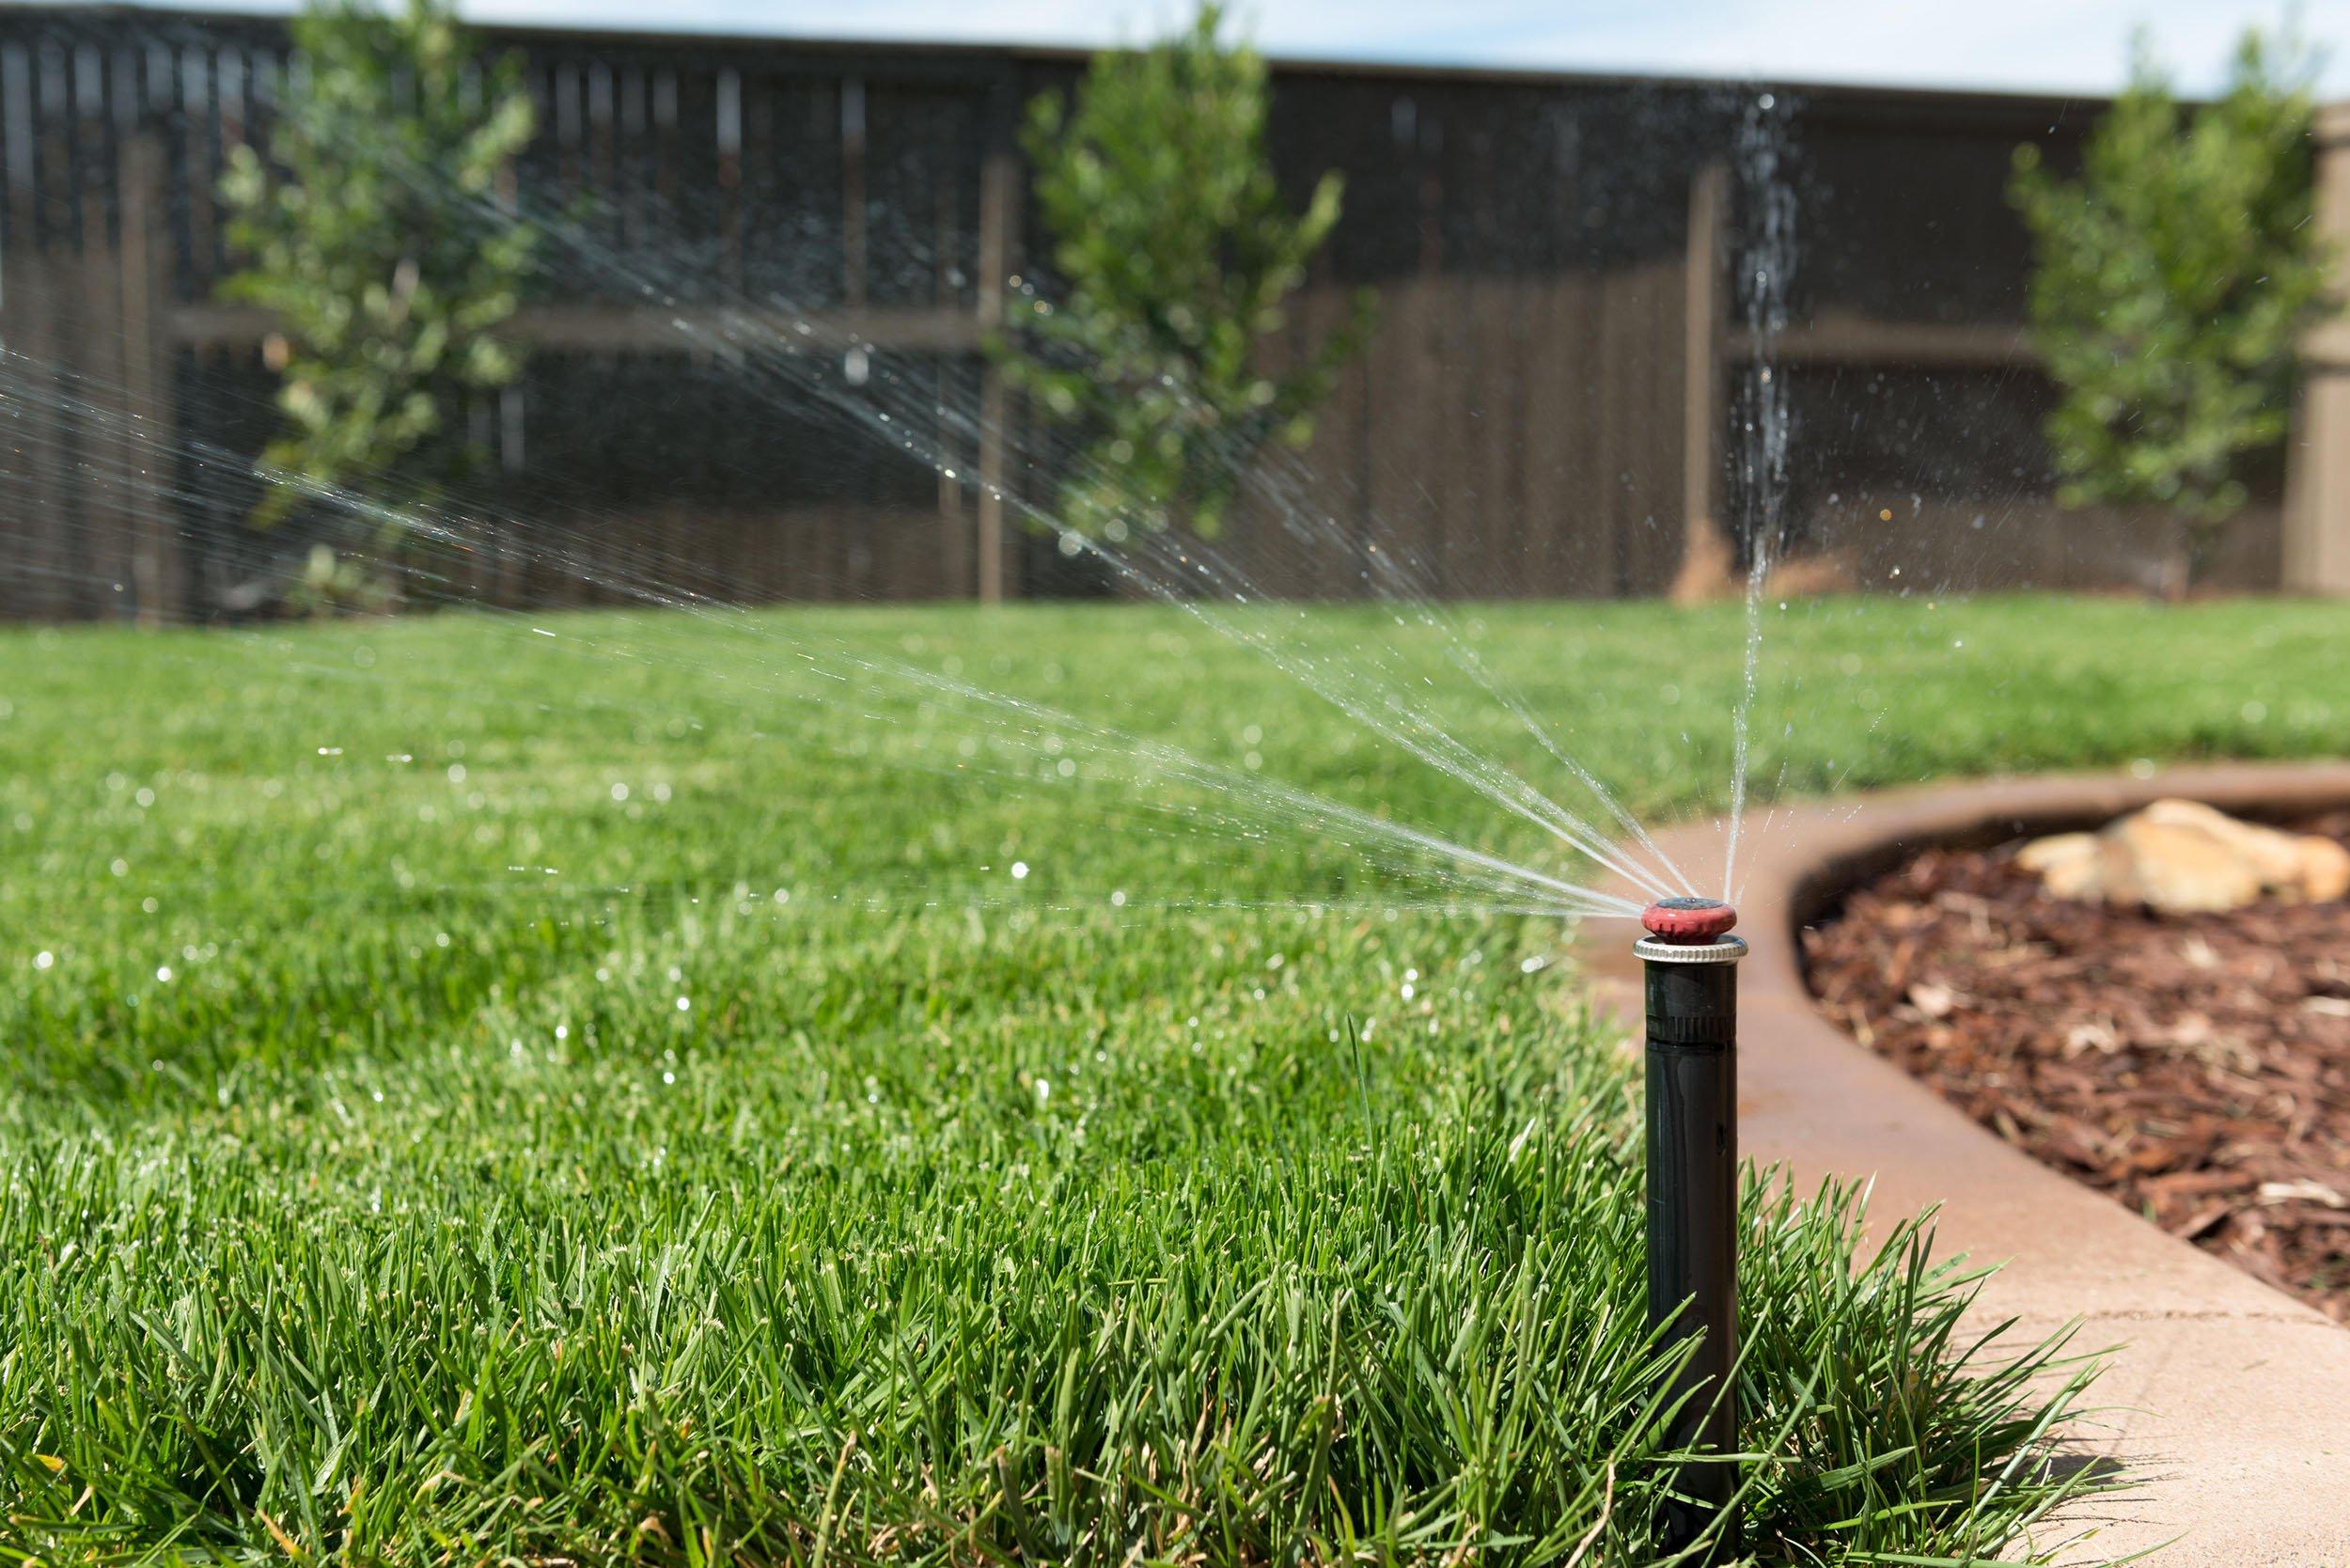 when should i stop watering my lawn in utah